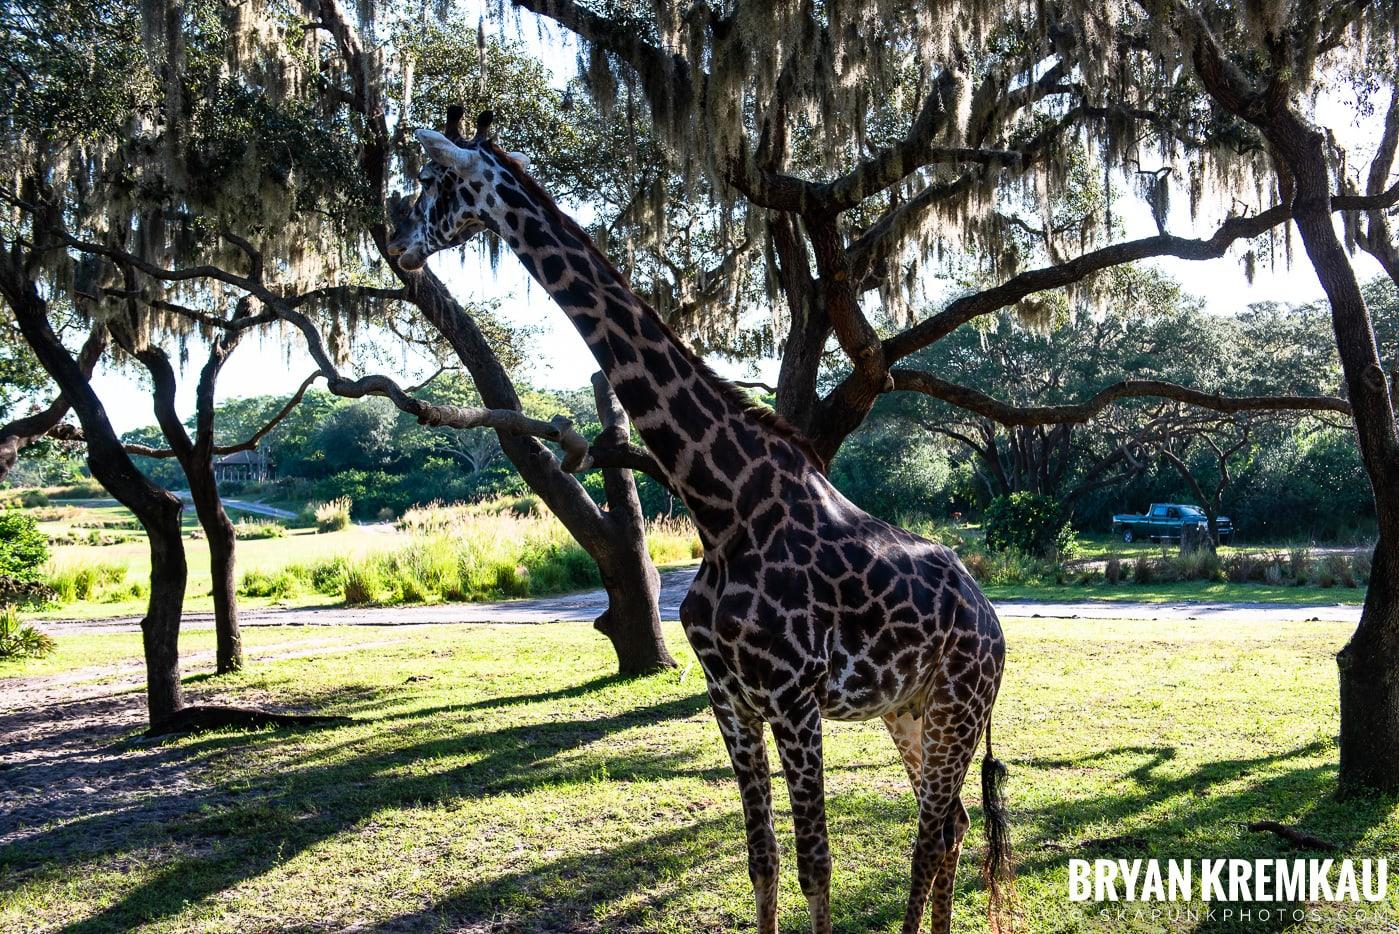 Walt Disney World Vacation: Day 5 (Animal Kingdom / Disney's Hollywood Studios) - 10.3.19 (71)